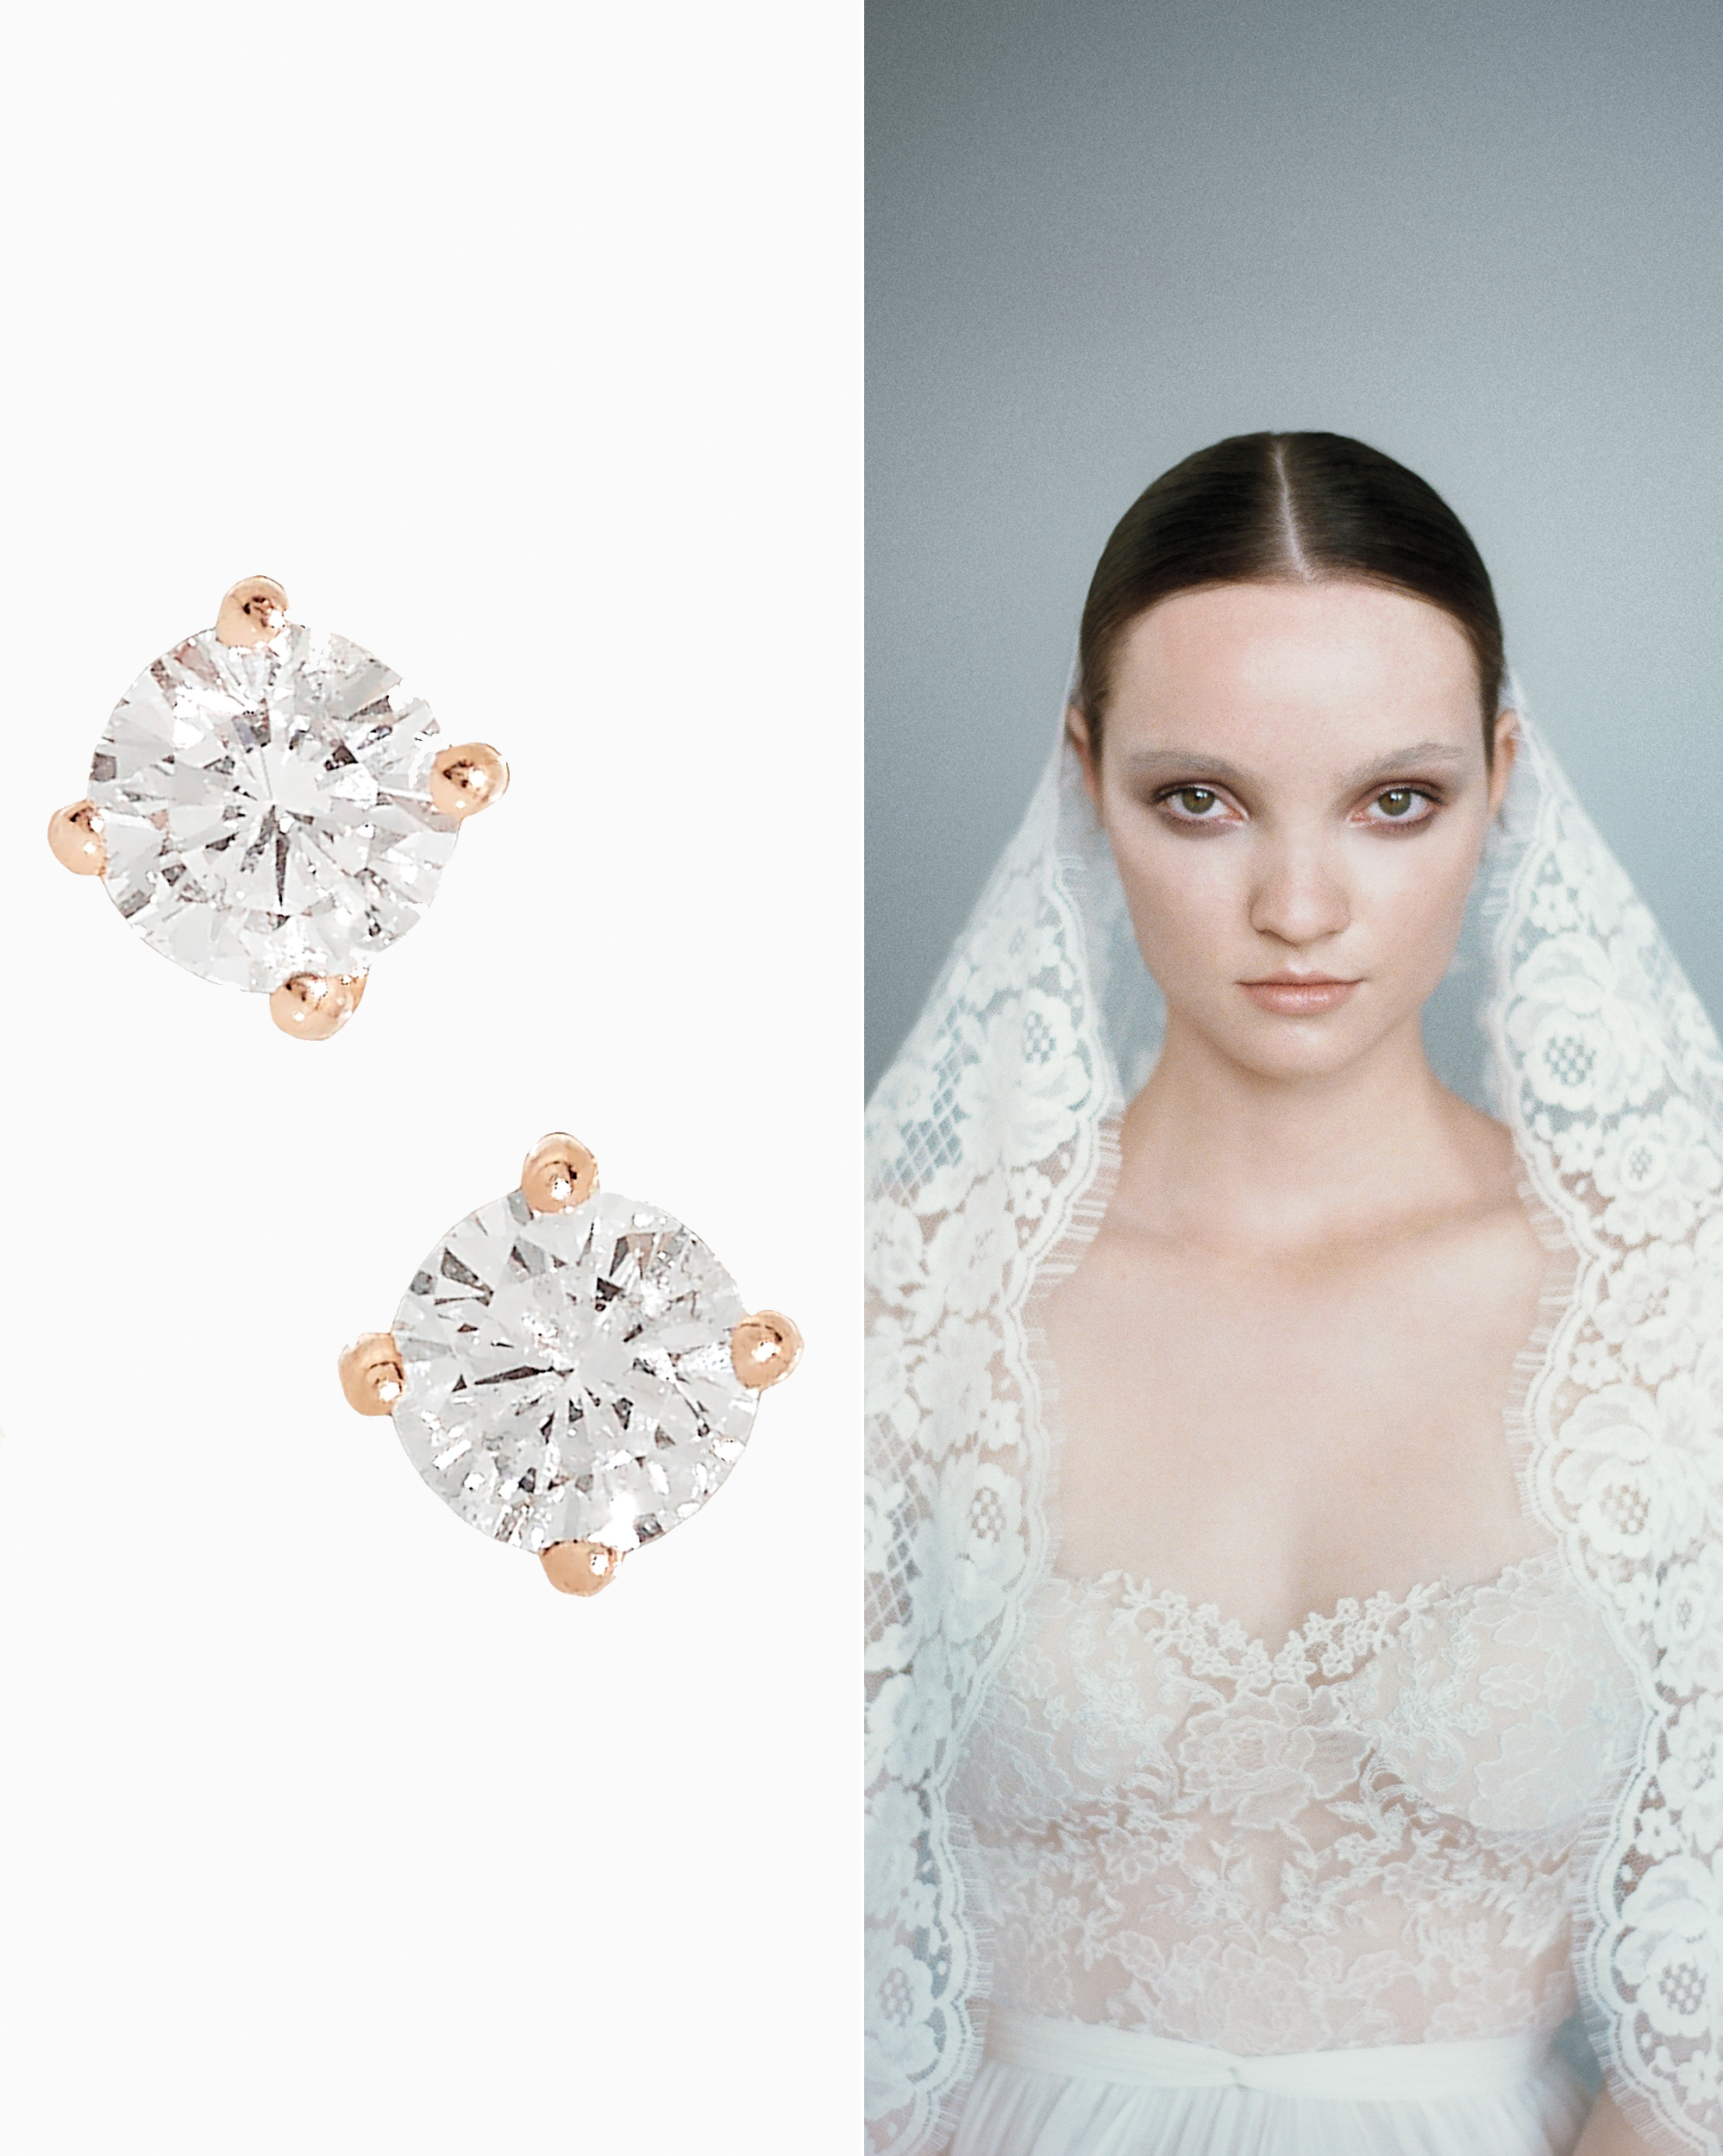 veil-earring-pairs-lace-veil-anita-ko-1115.jpg